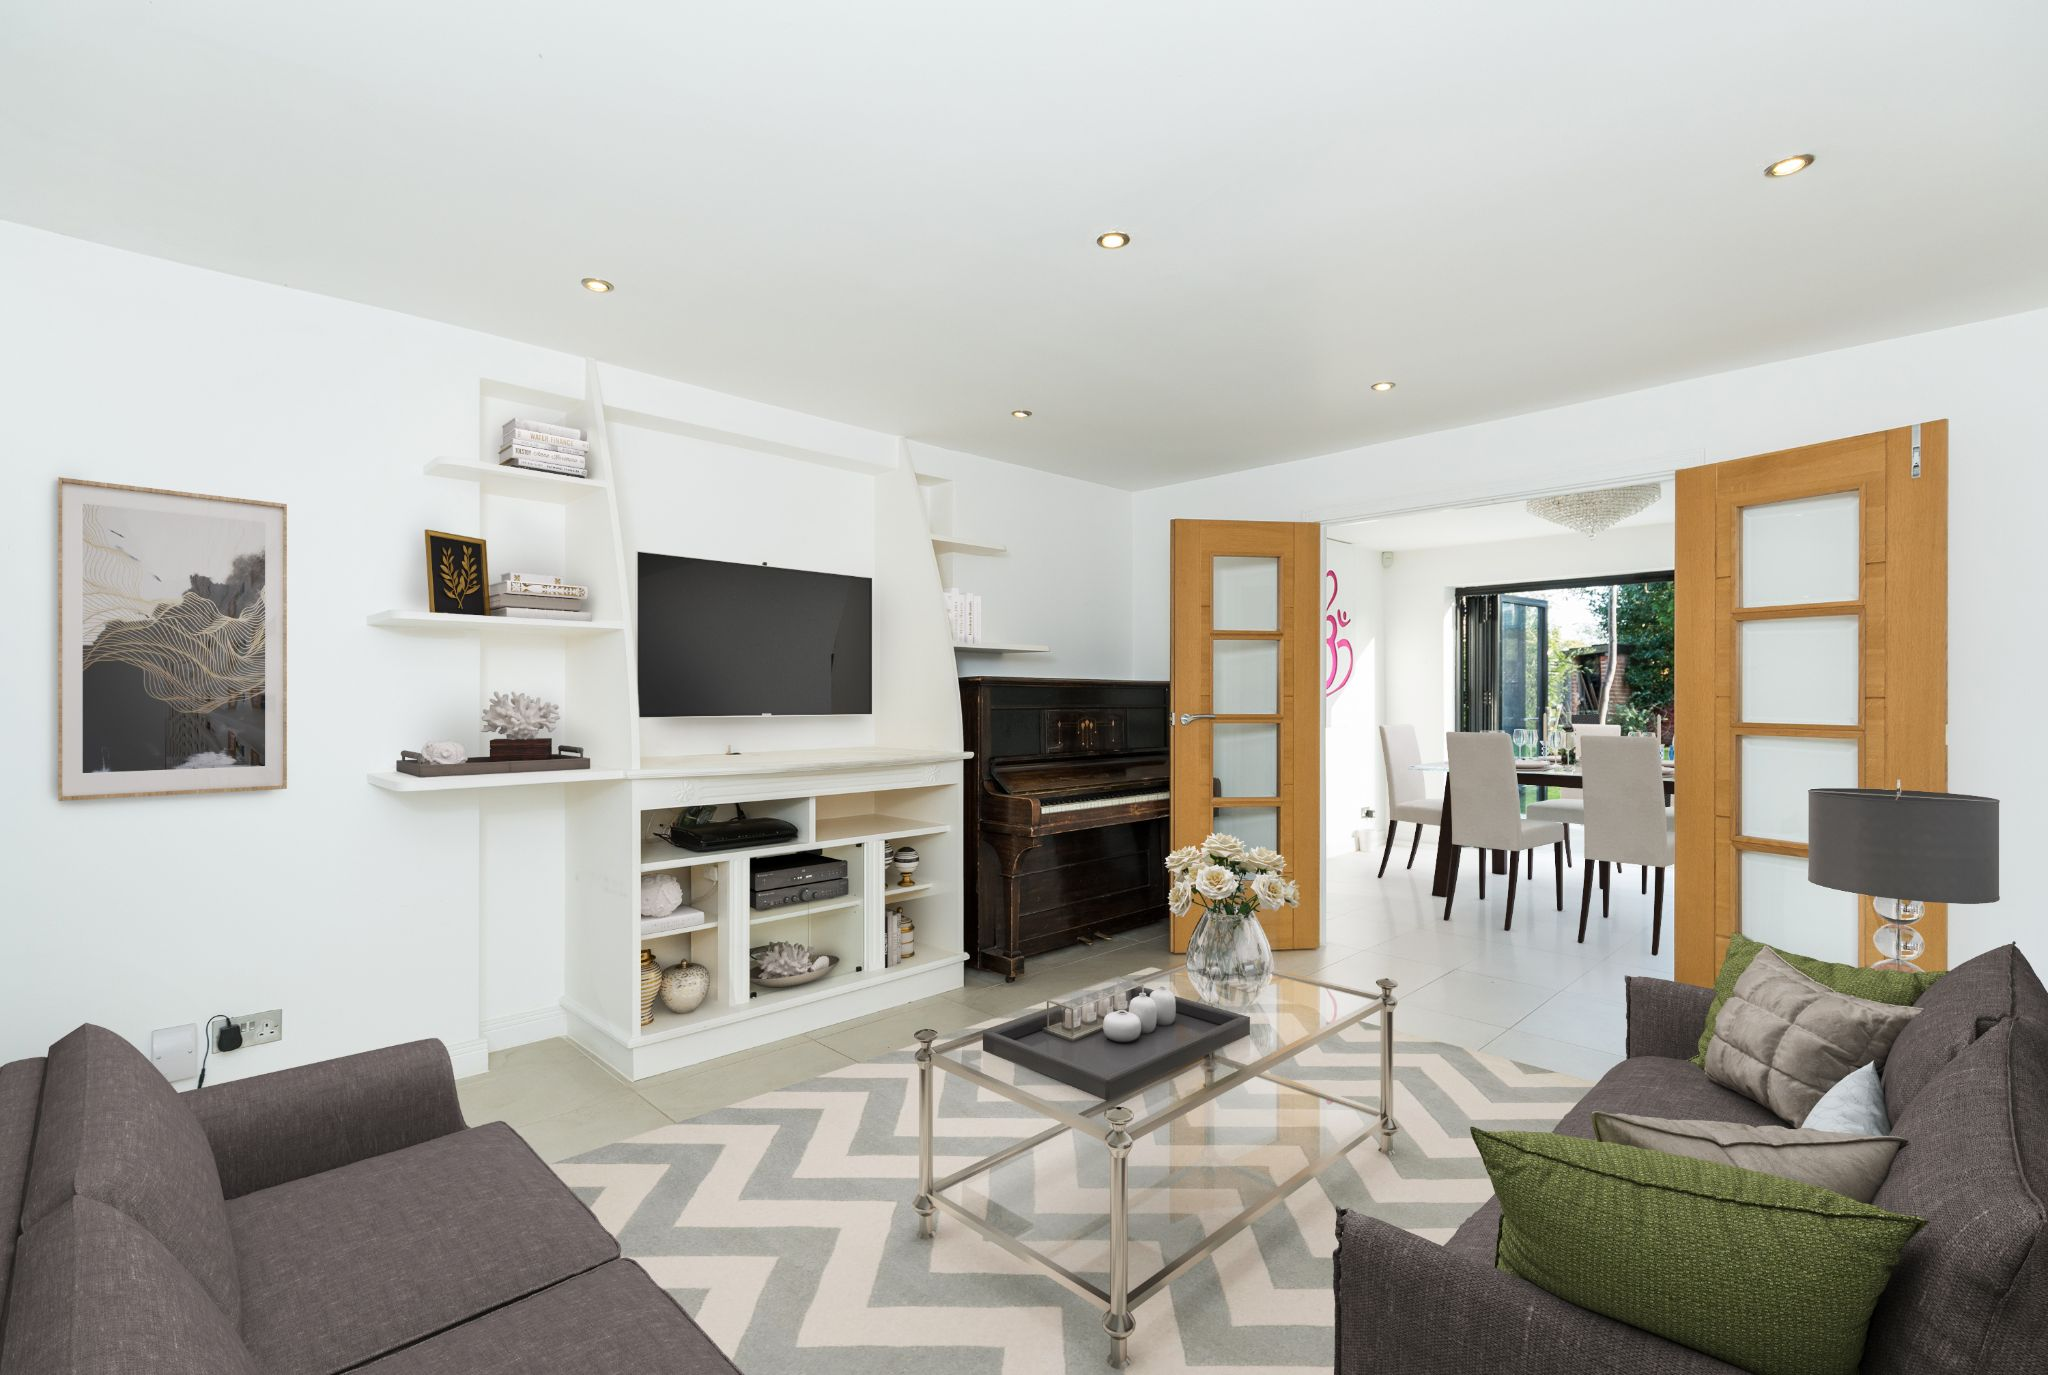 5 Bedroom Detached House For Sale - Sitting room